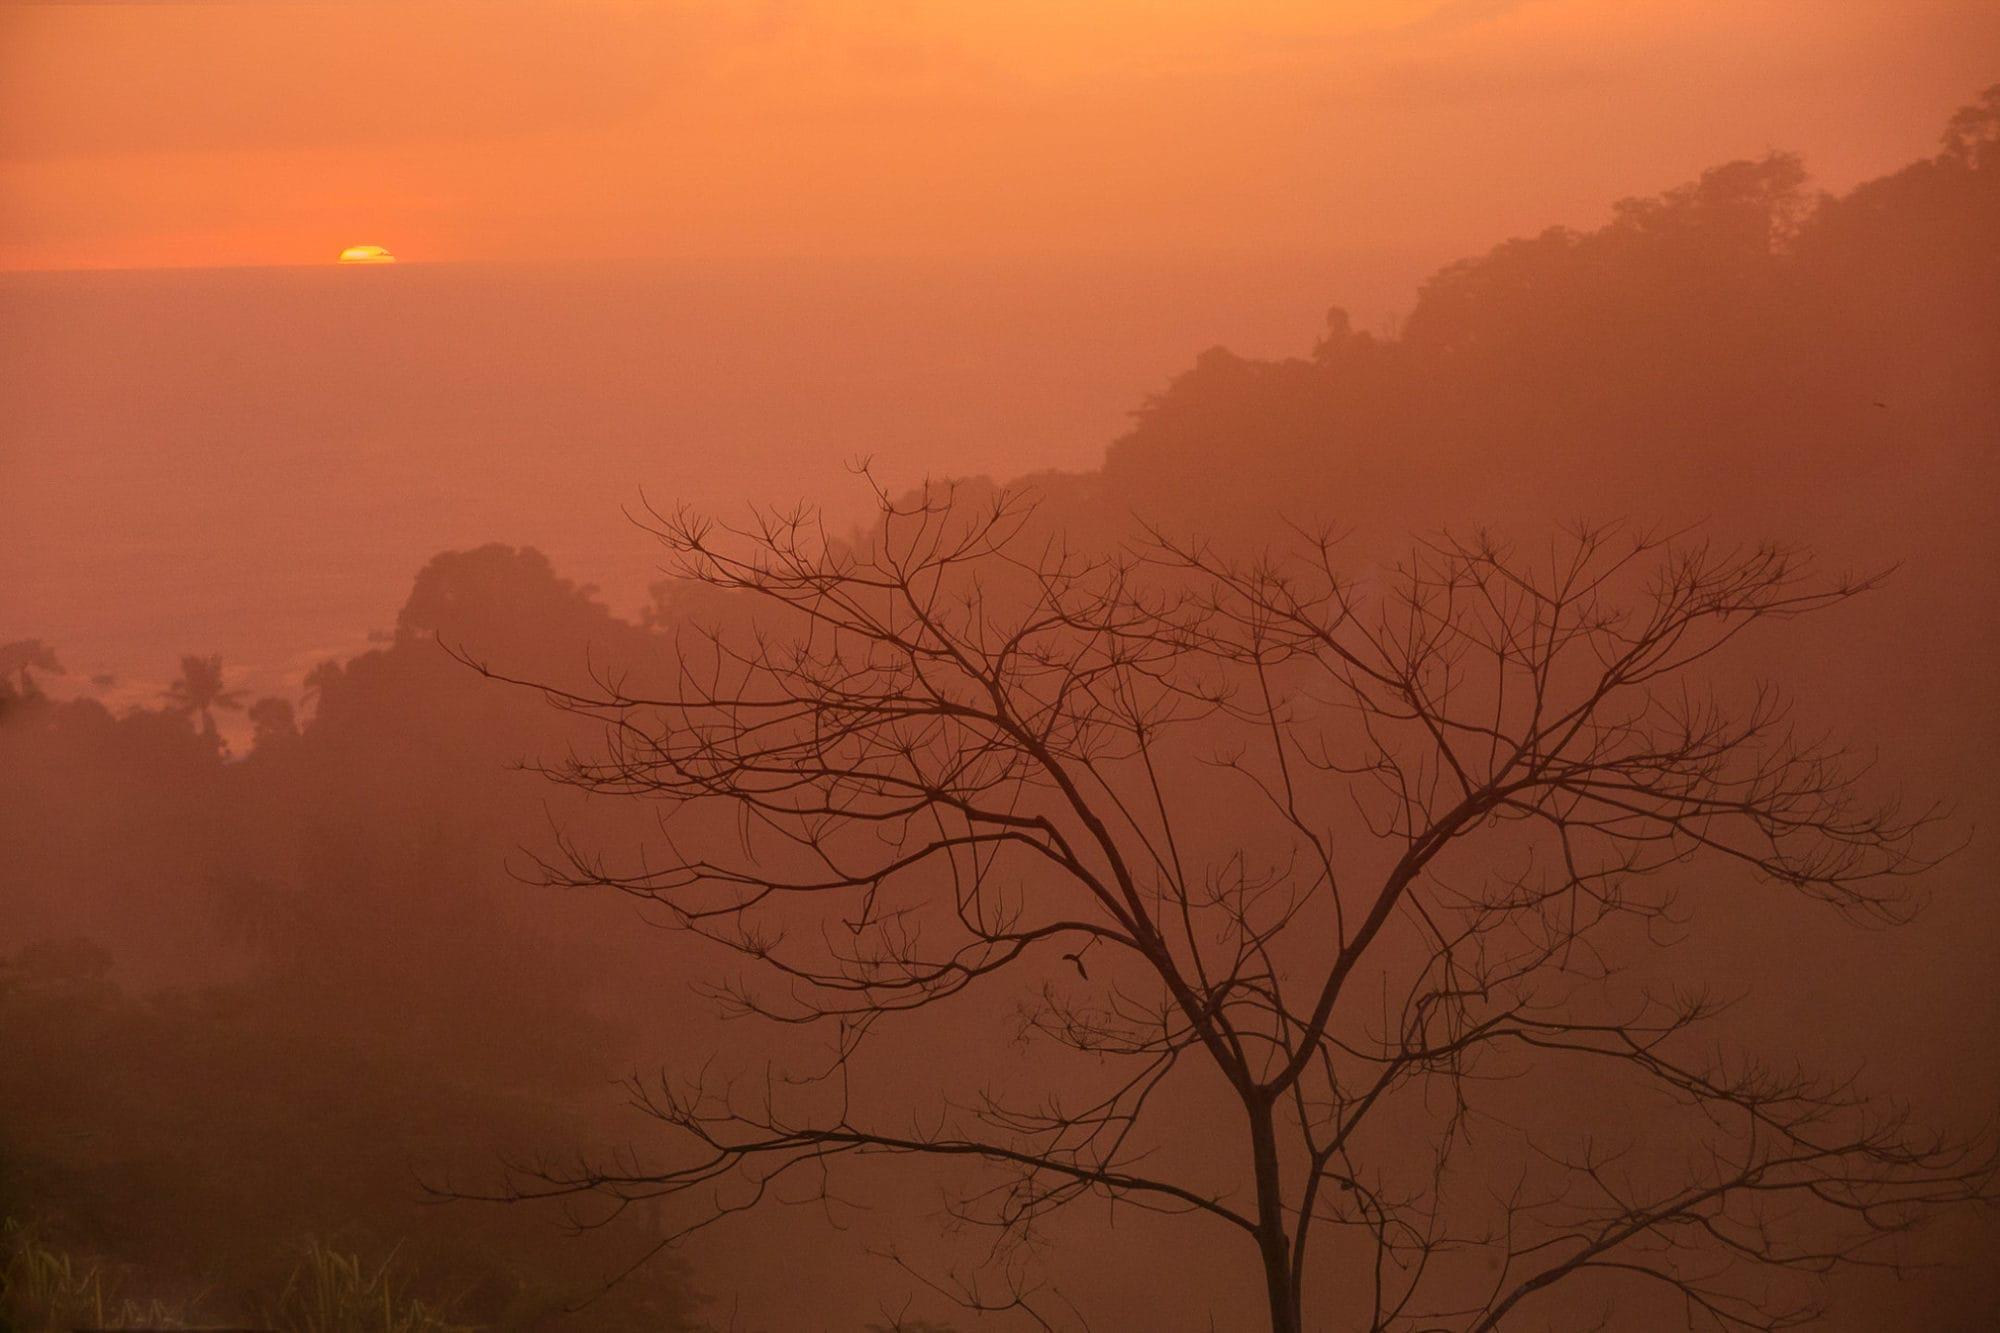 Sunset in Rainy Season in Costa Rica